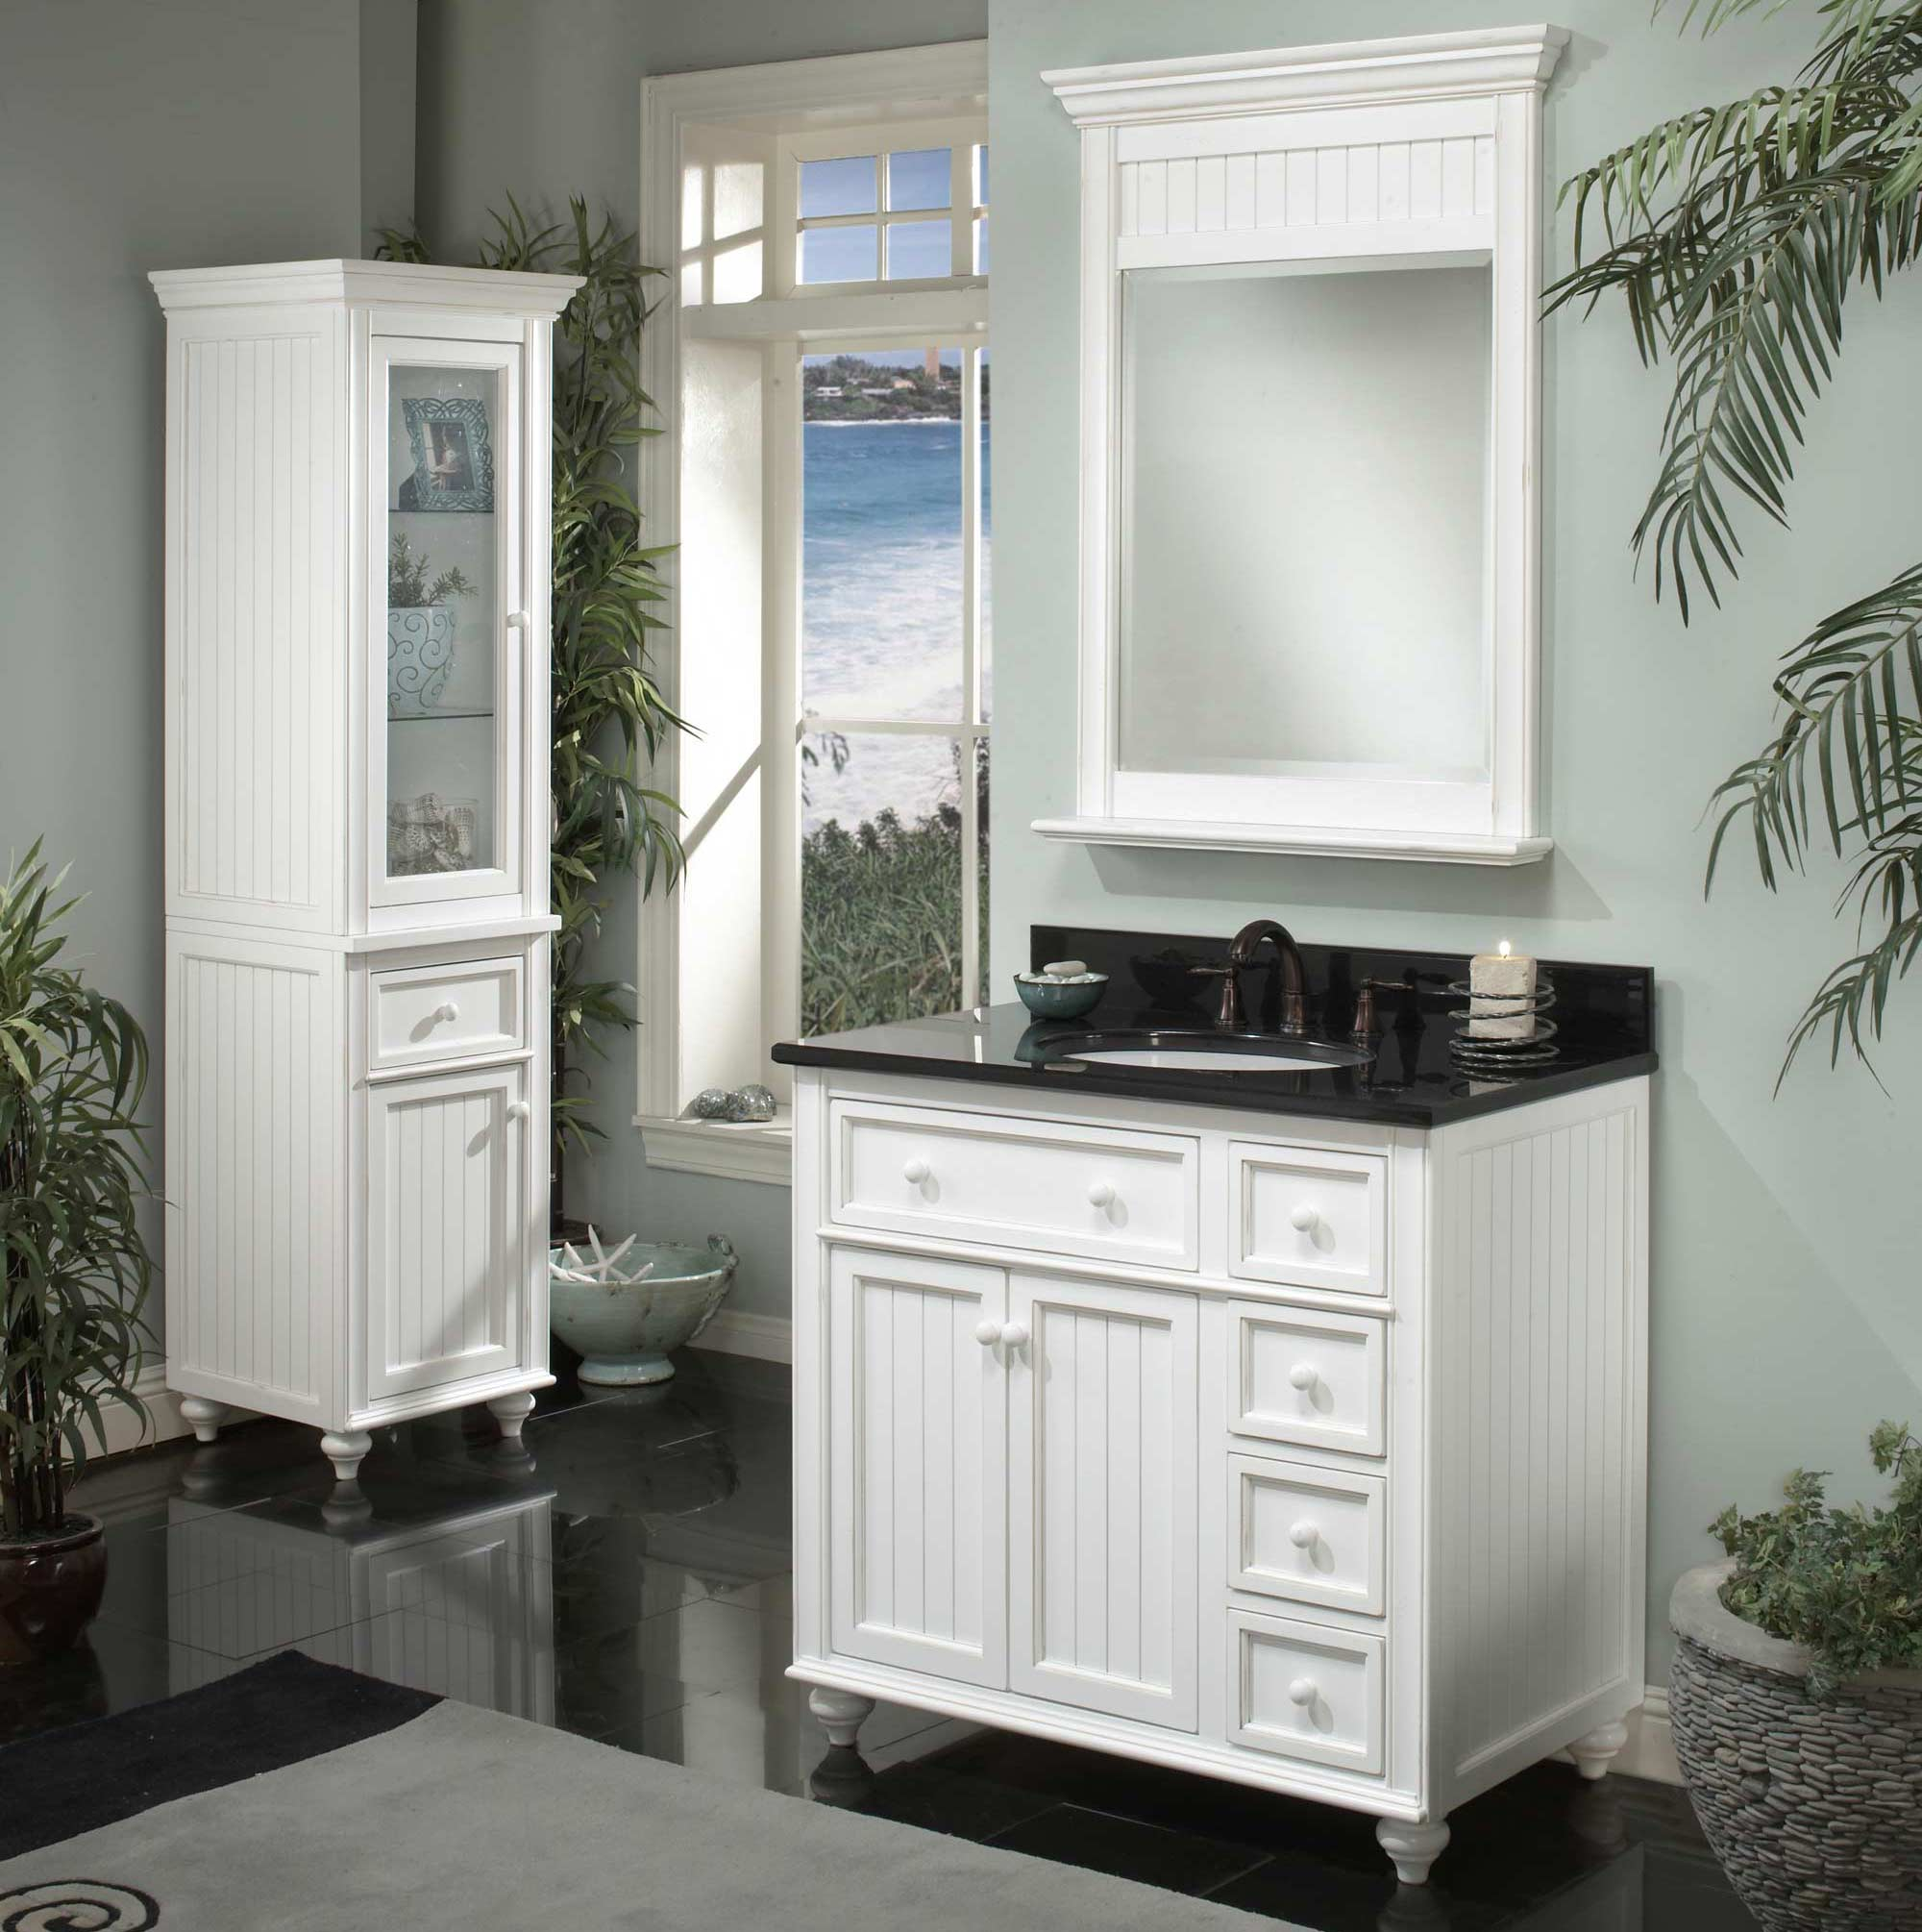 lighting fixtures the elegant white bathroom lighting collection